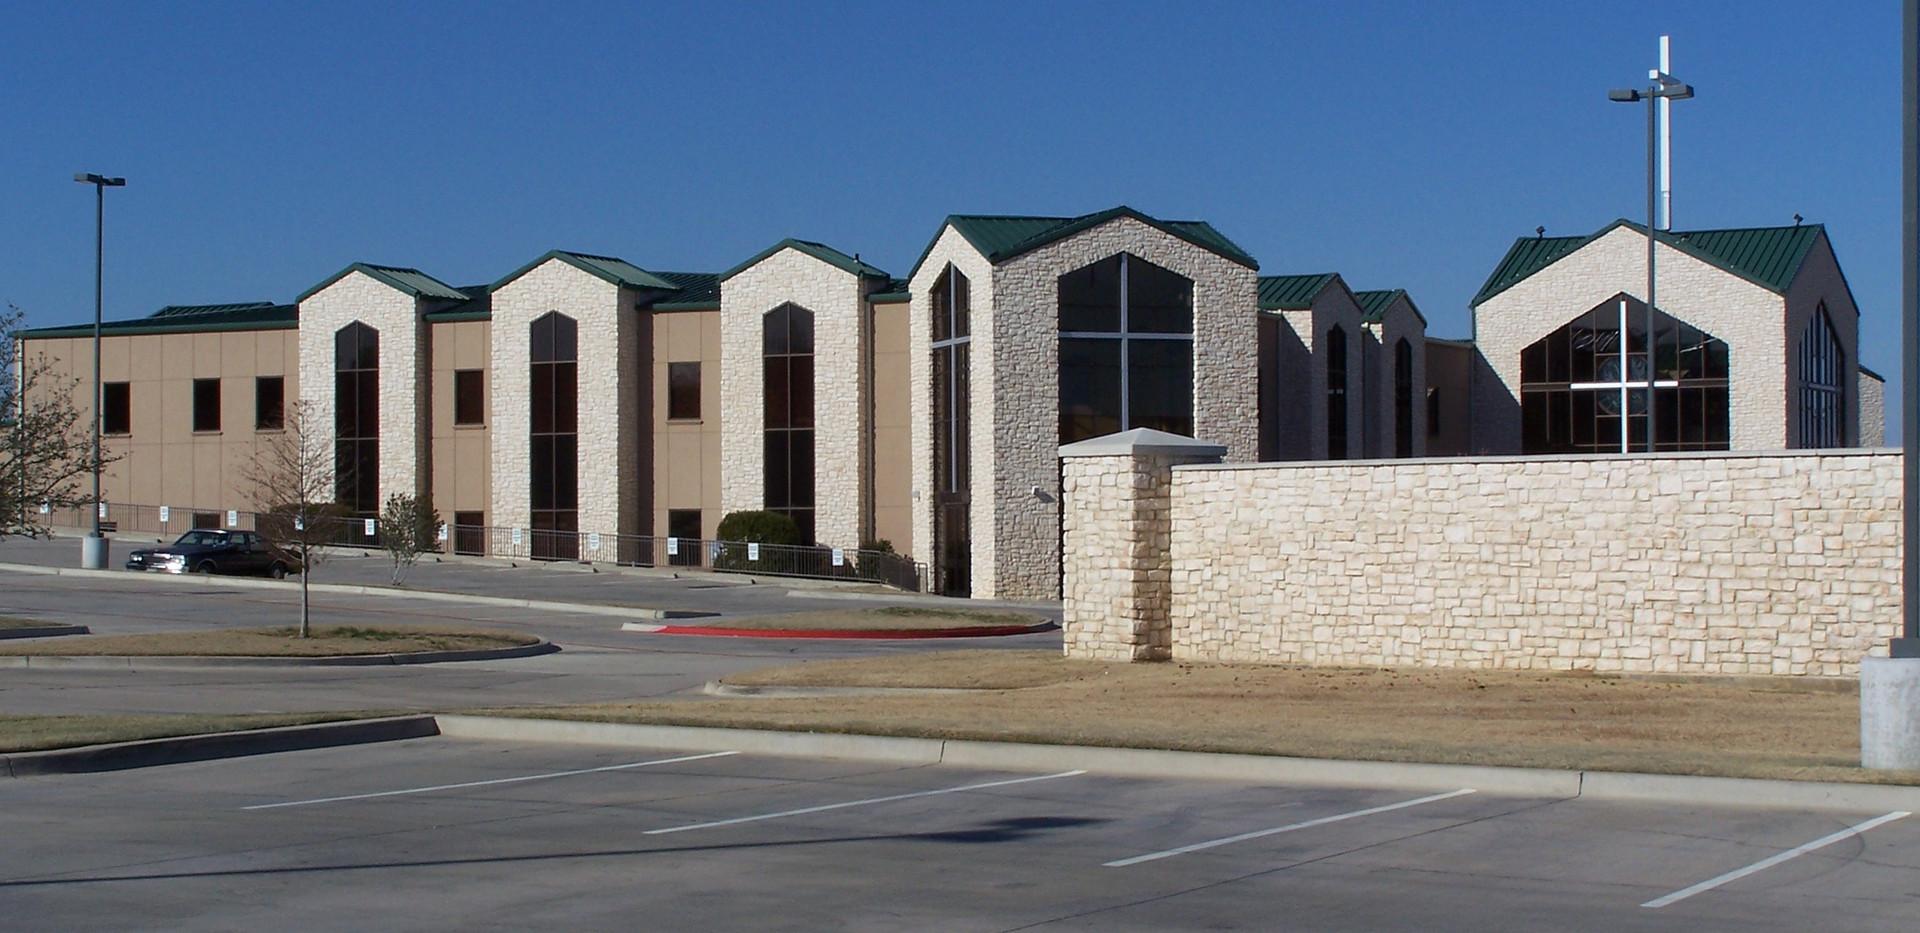 Gateway Church | Frank Dale Construction